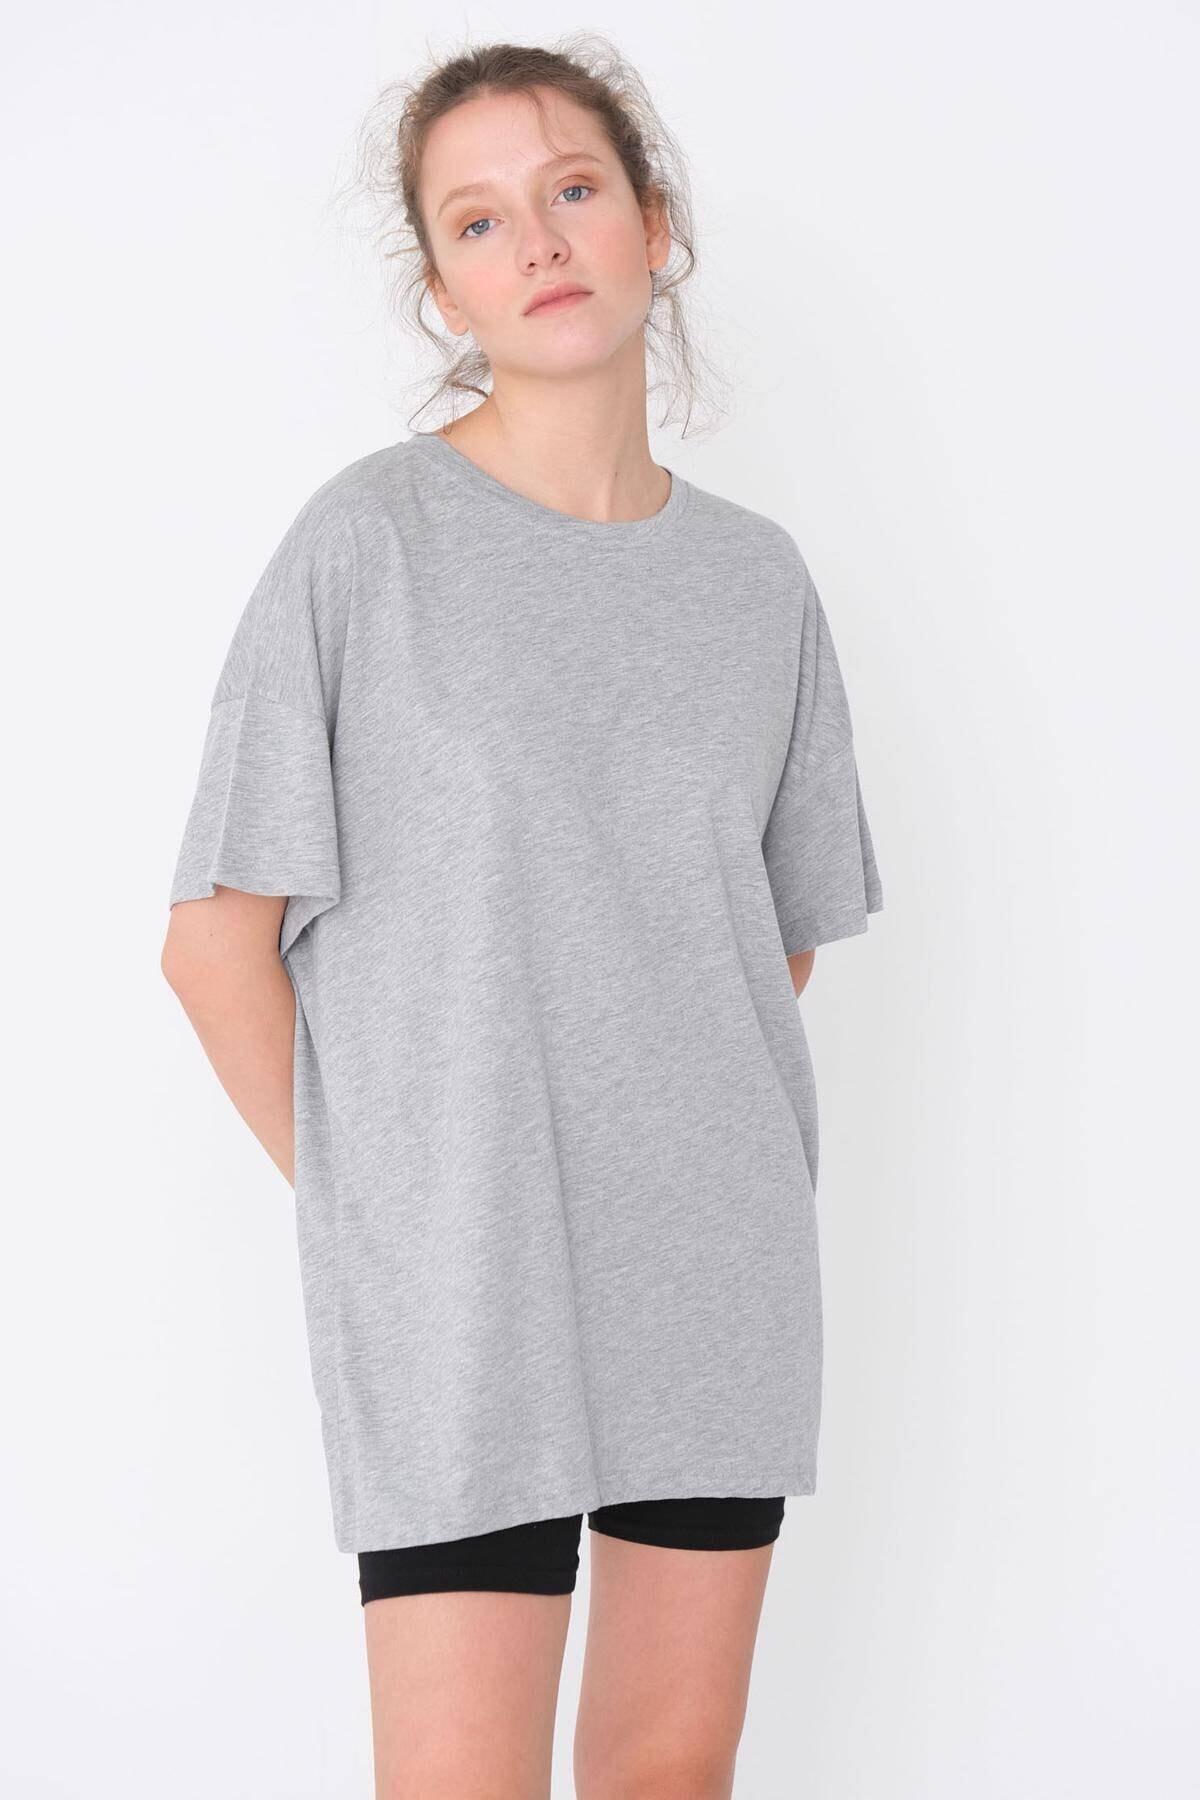 Kadın Gri Basic T-Shirt P0337 - T11 Adx-0000021644